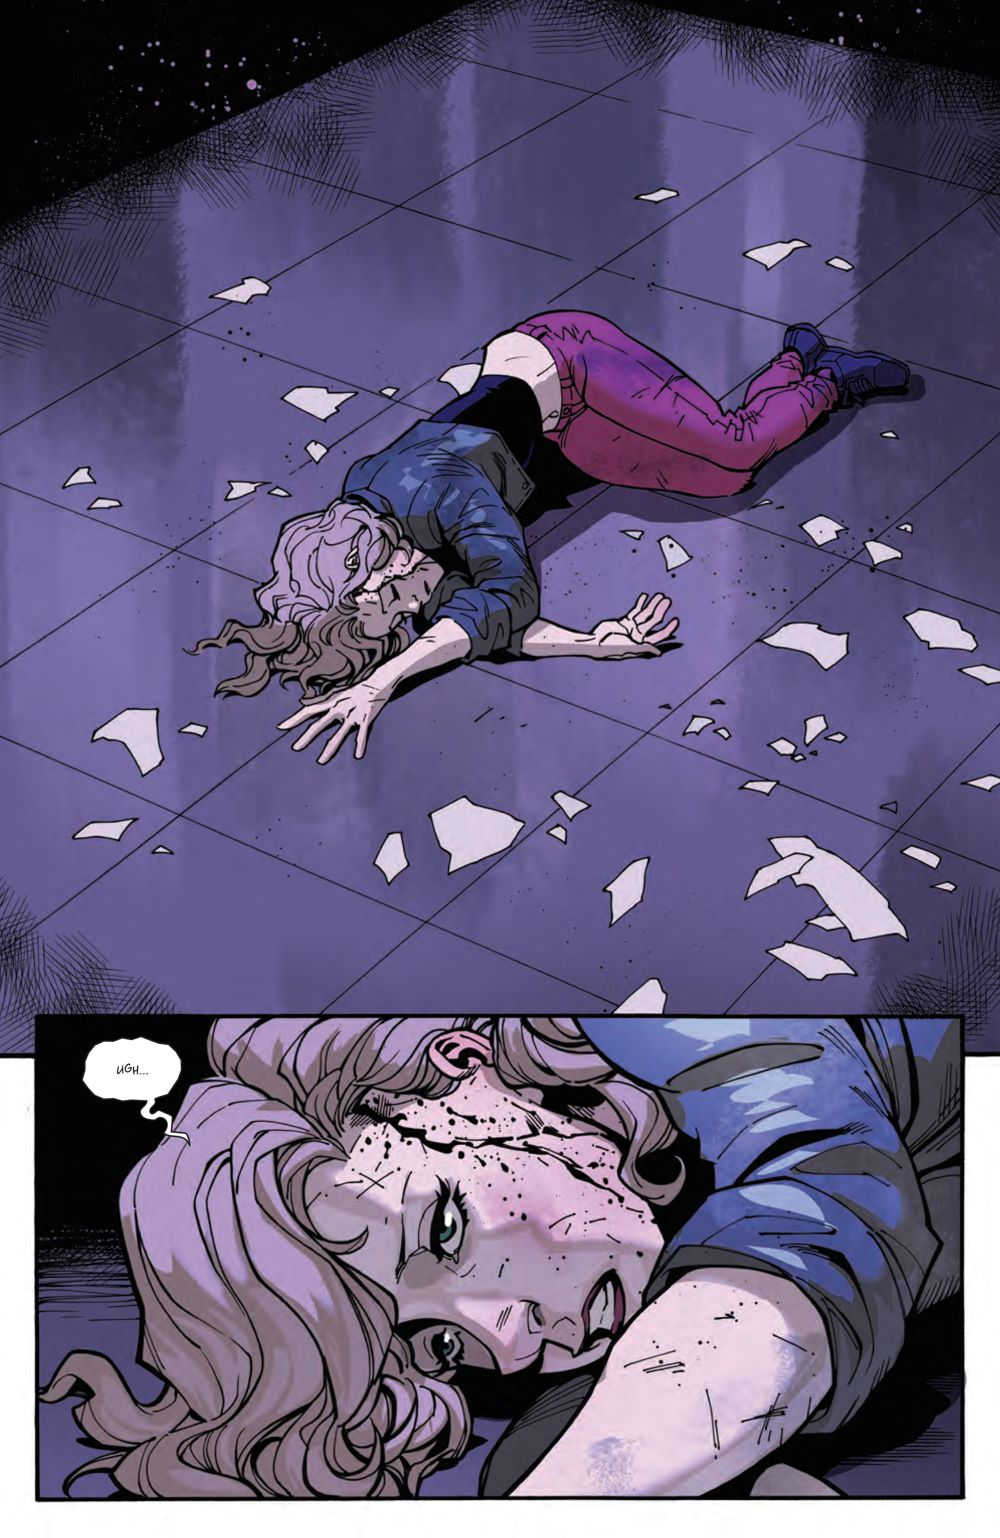 Buffy_024_PRESS_3 ComicList Previews: BUFFY THE VAMPIRE SLAYER #24